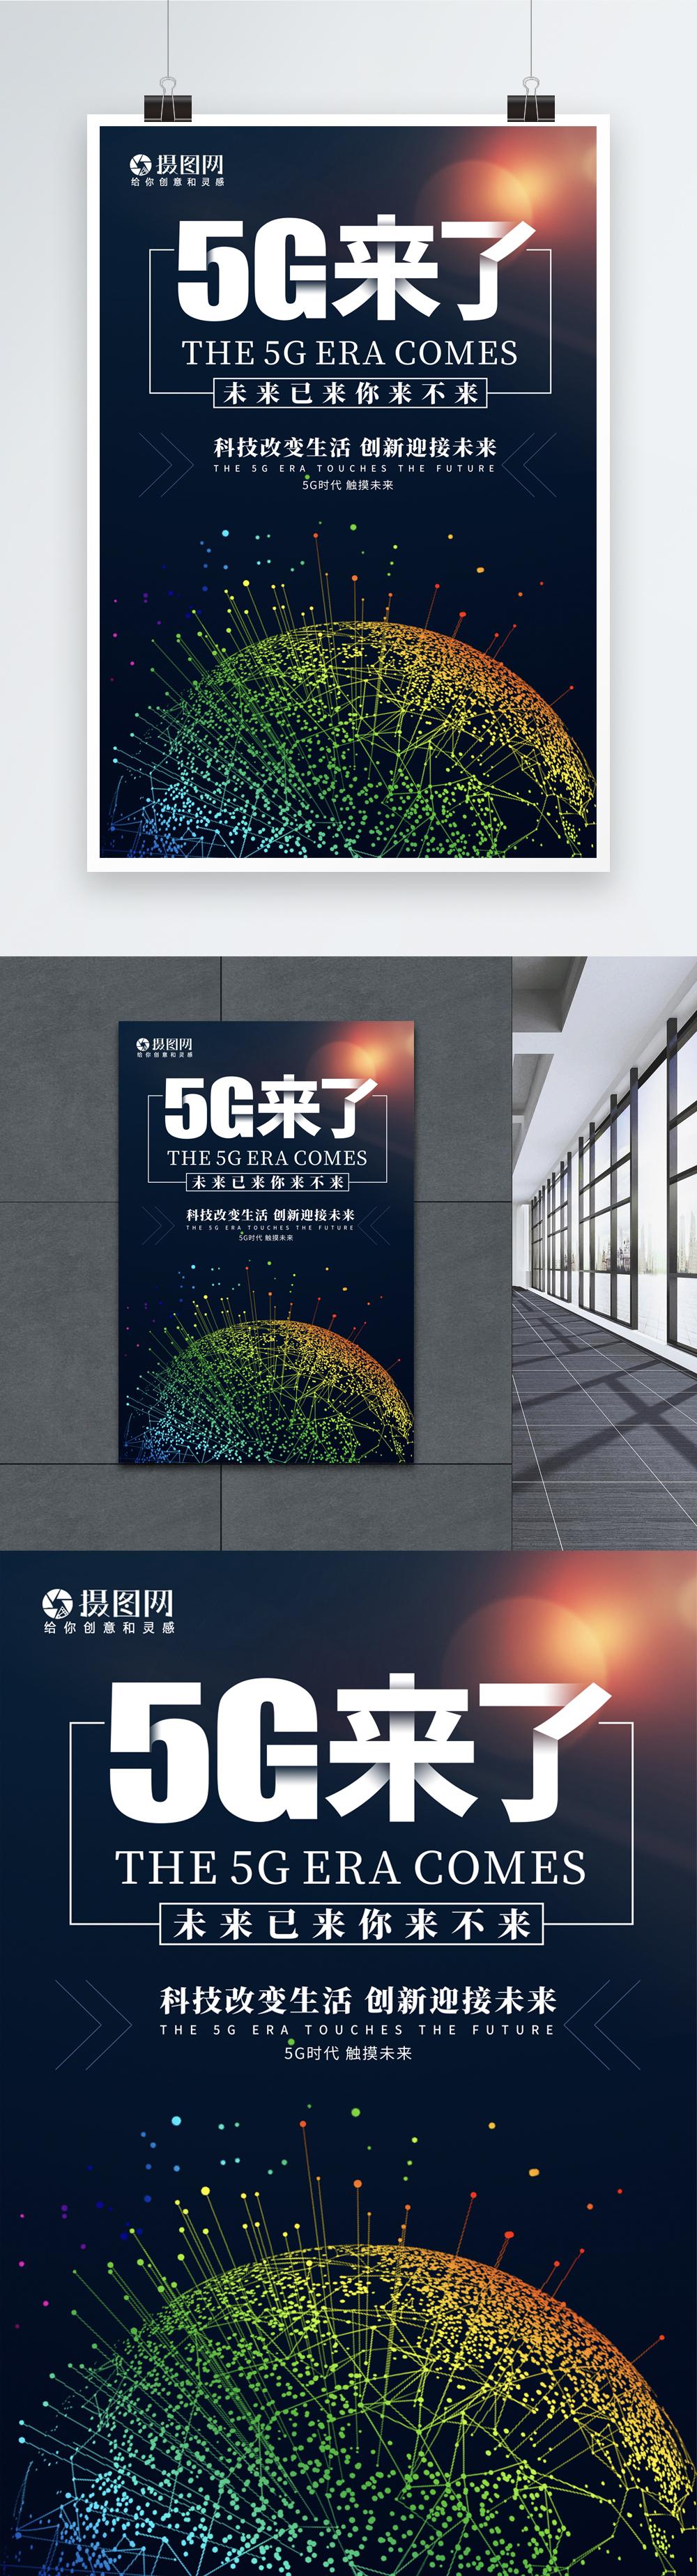 5g时代科技海报图片素材编号400436429_prf高清图片